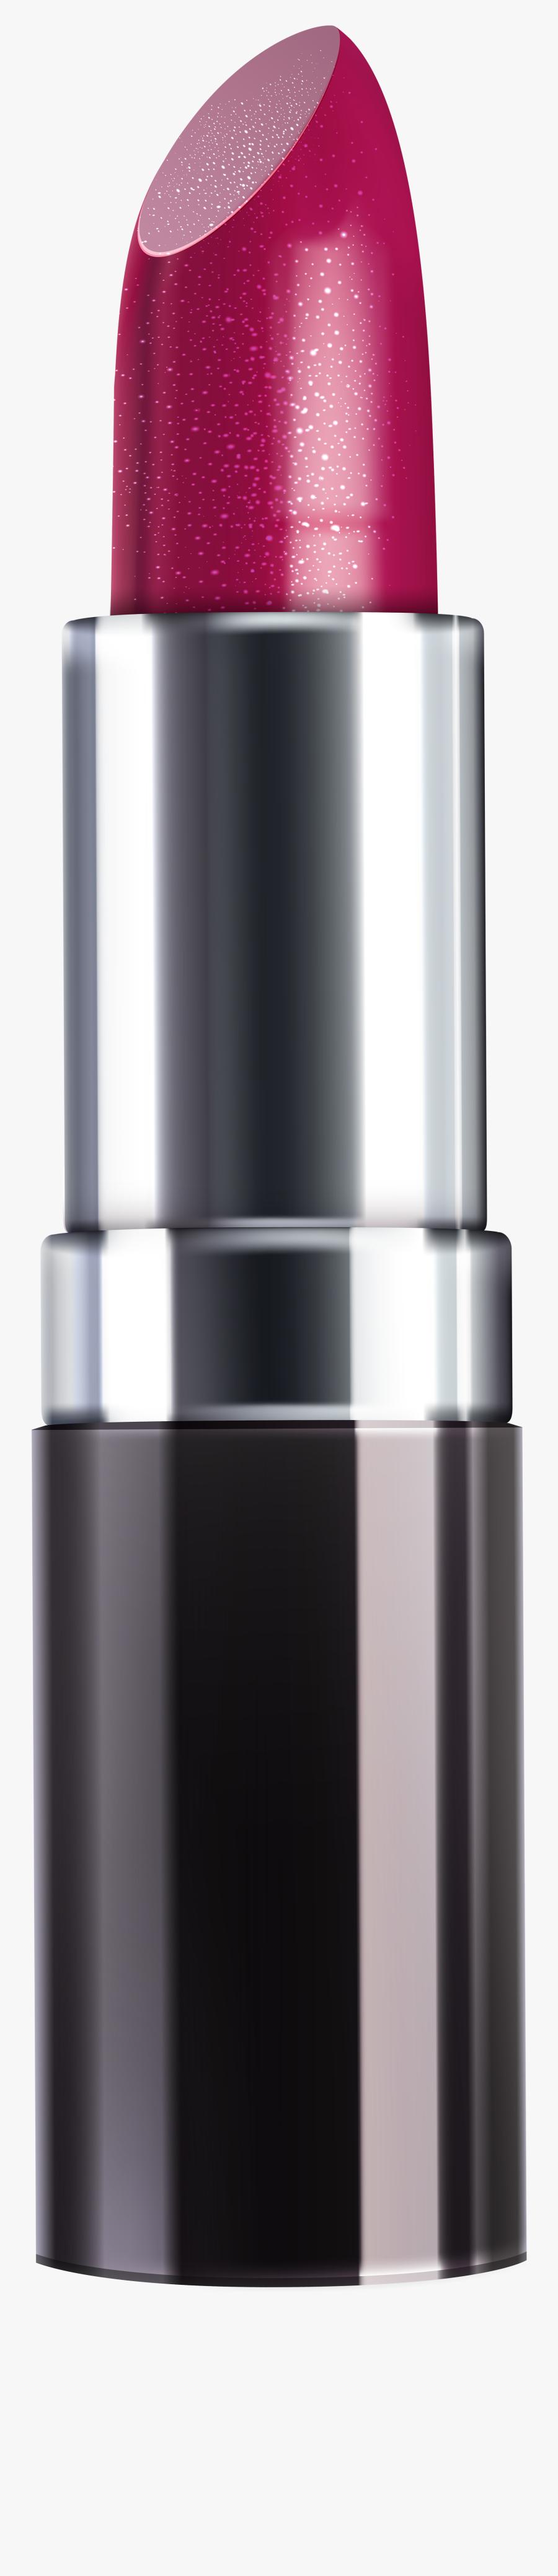 Transparent Transparent Lipstick Clipart - Lipstick Clipart High Resolution, Transparent Clipart